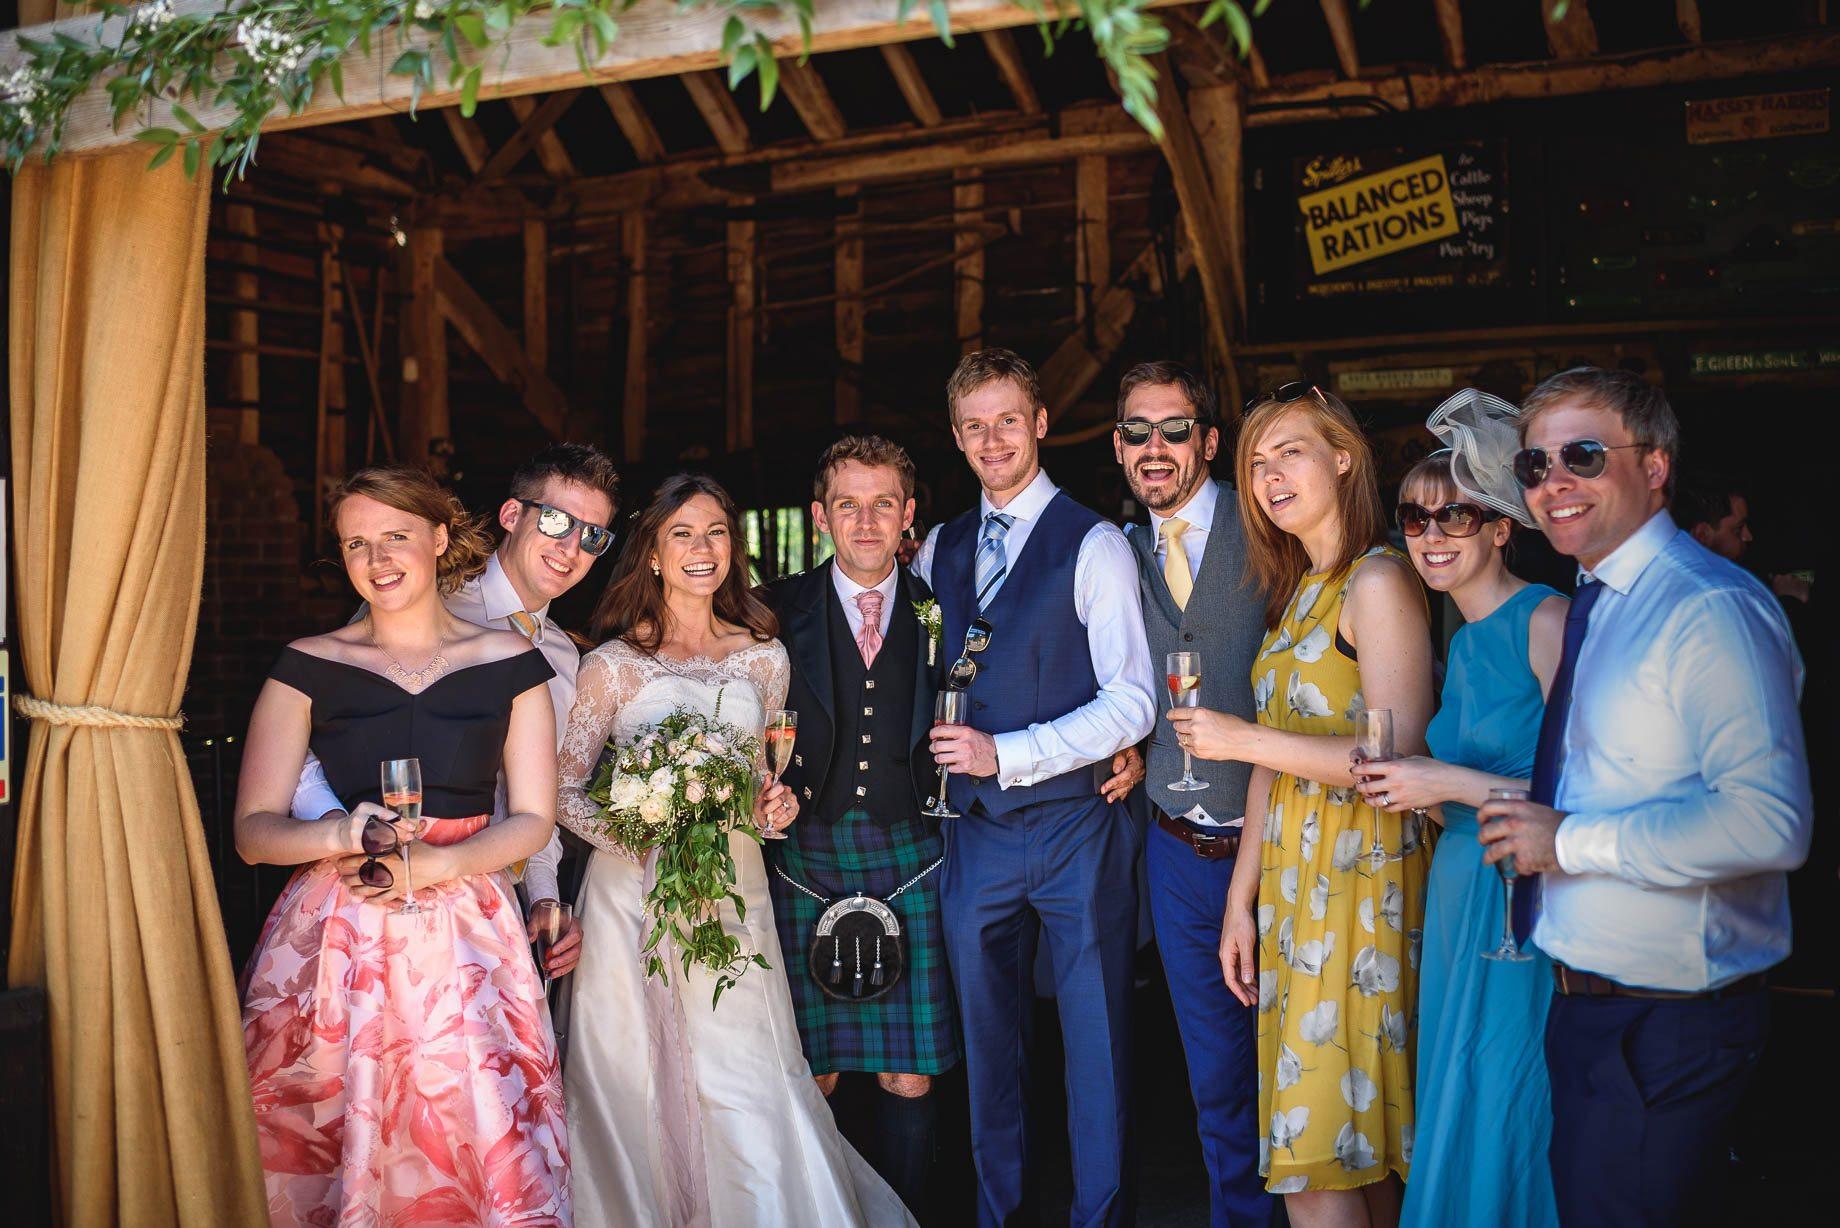 Gildings Barn wedding photography - Sarah and Steve (114 of 190)